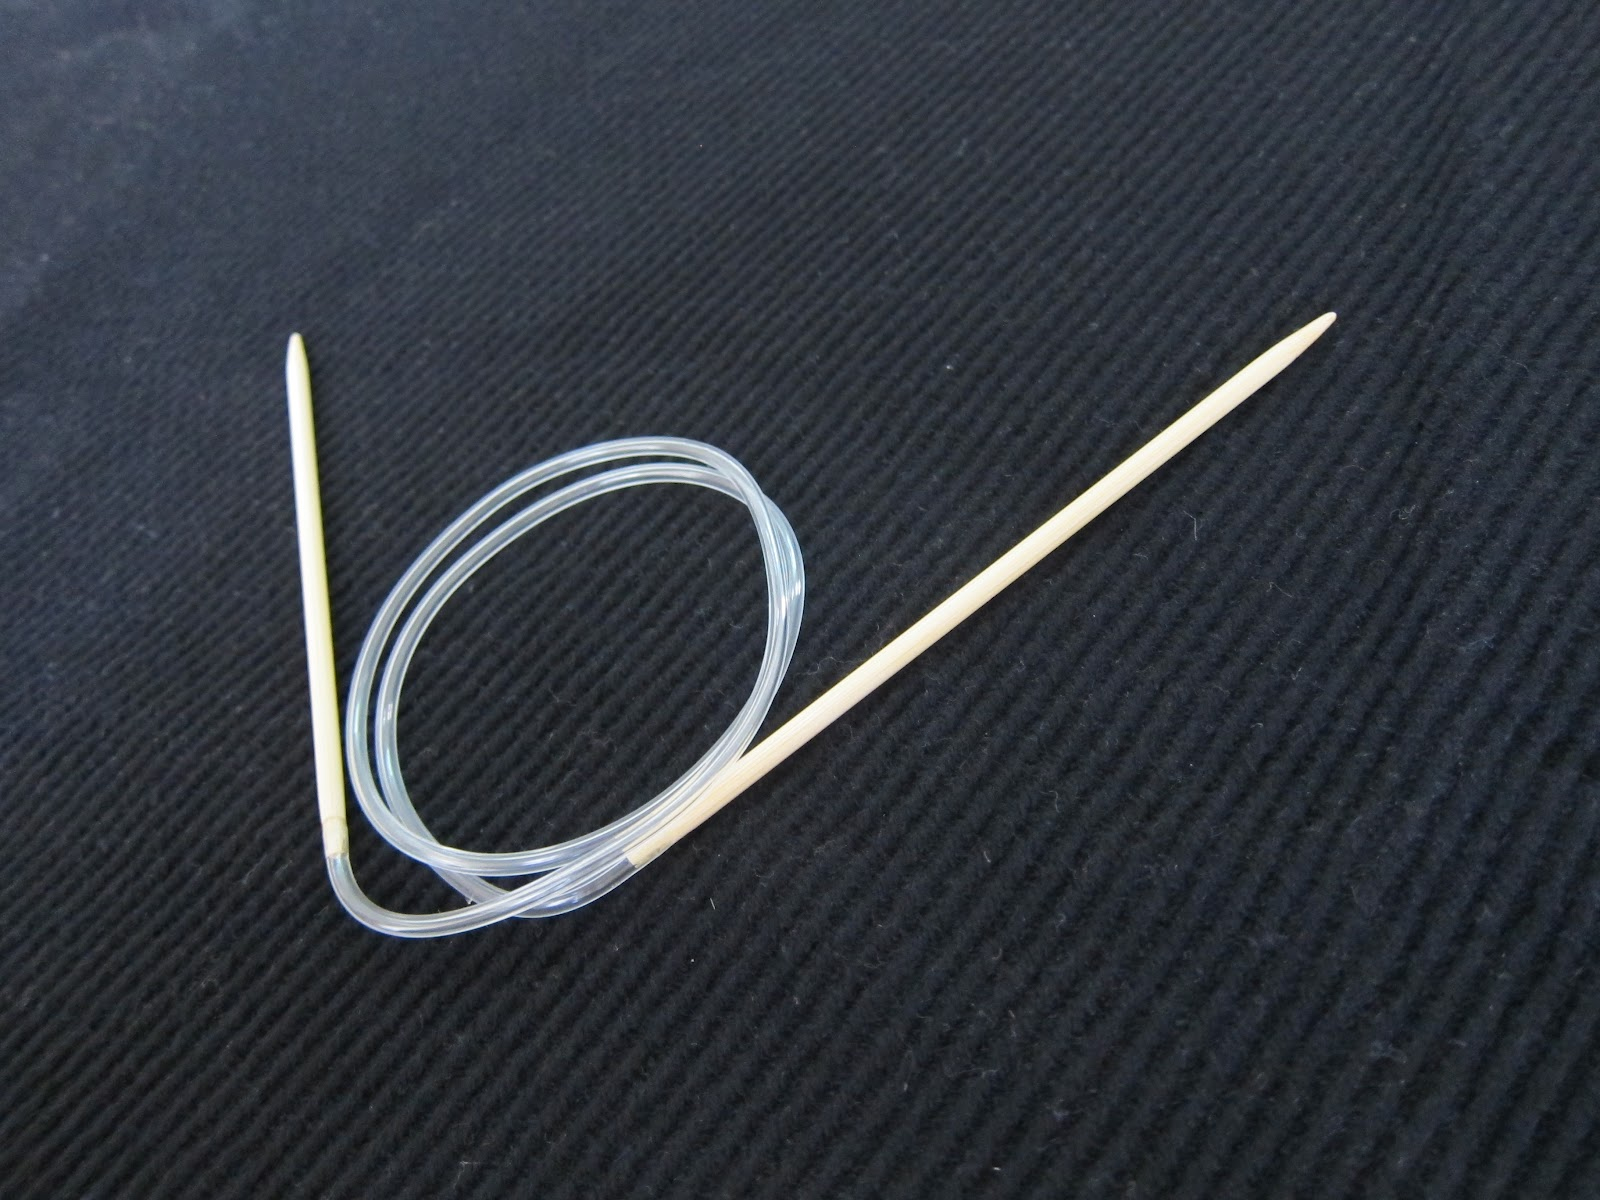 Knitting Needle Hs Code : Mommy s knitting room